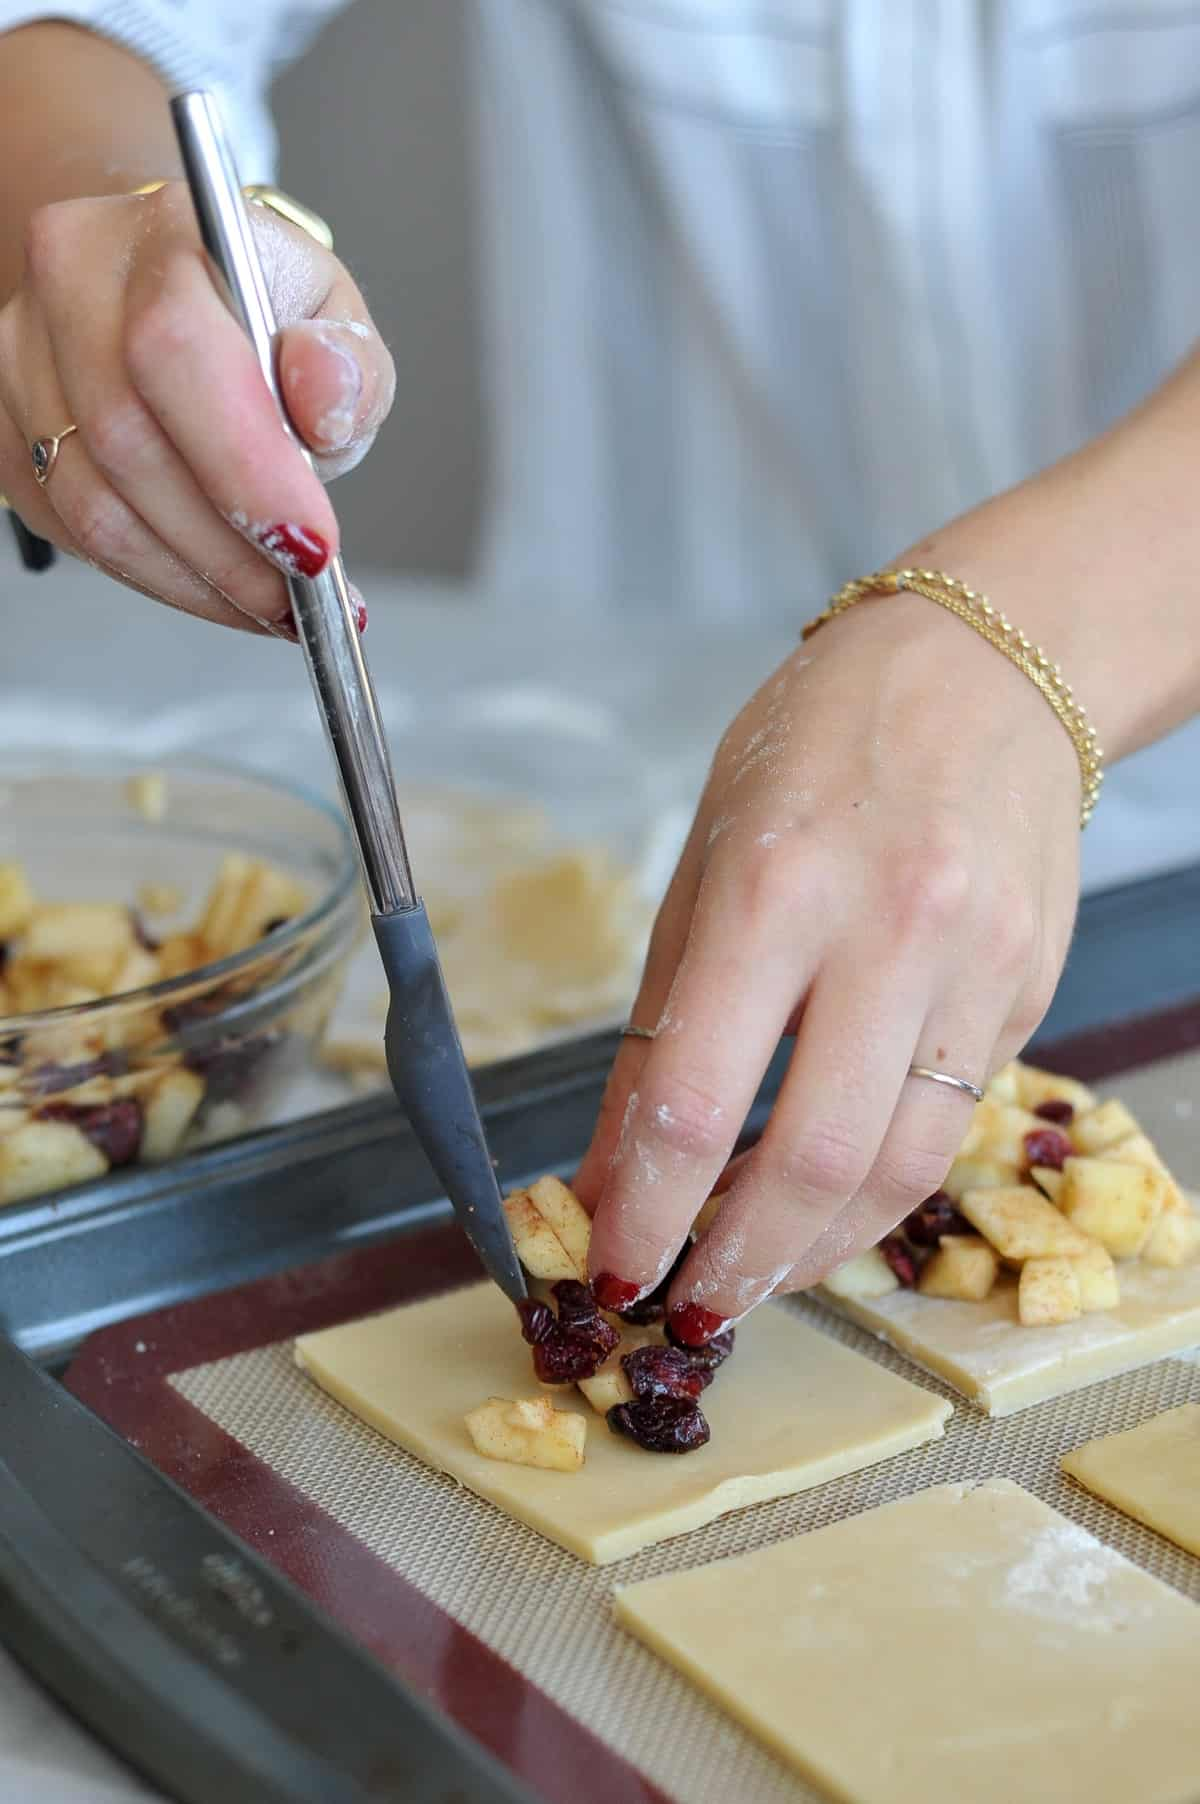 Apple hand pie recipe, cranberry apple hand pies, homemade pop-tarts - My Style Vita @mystylevita